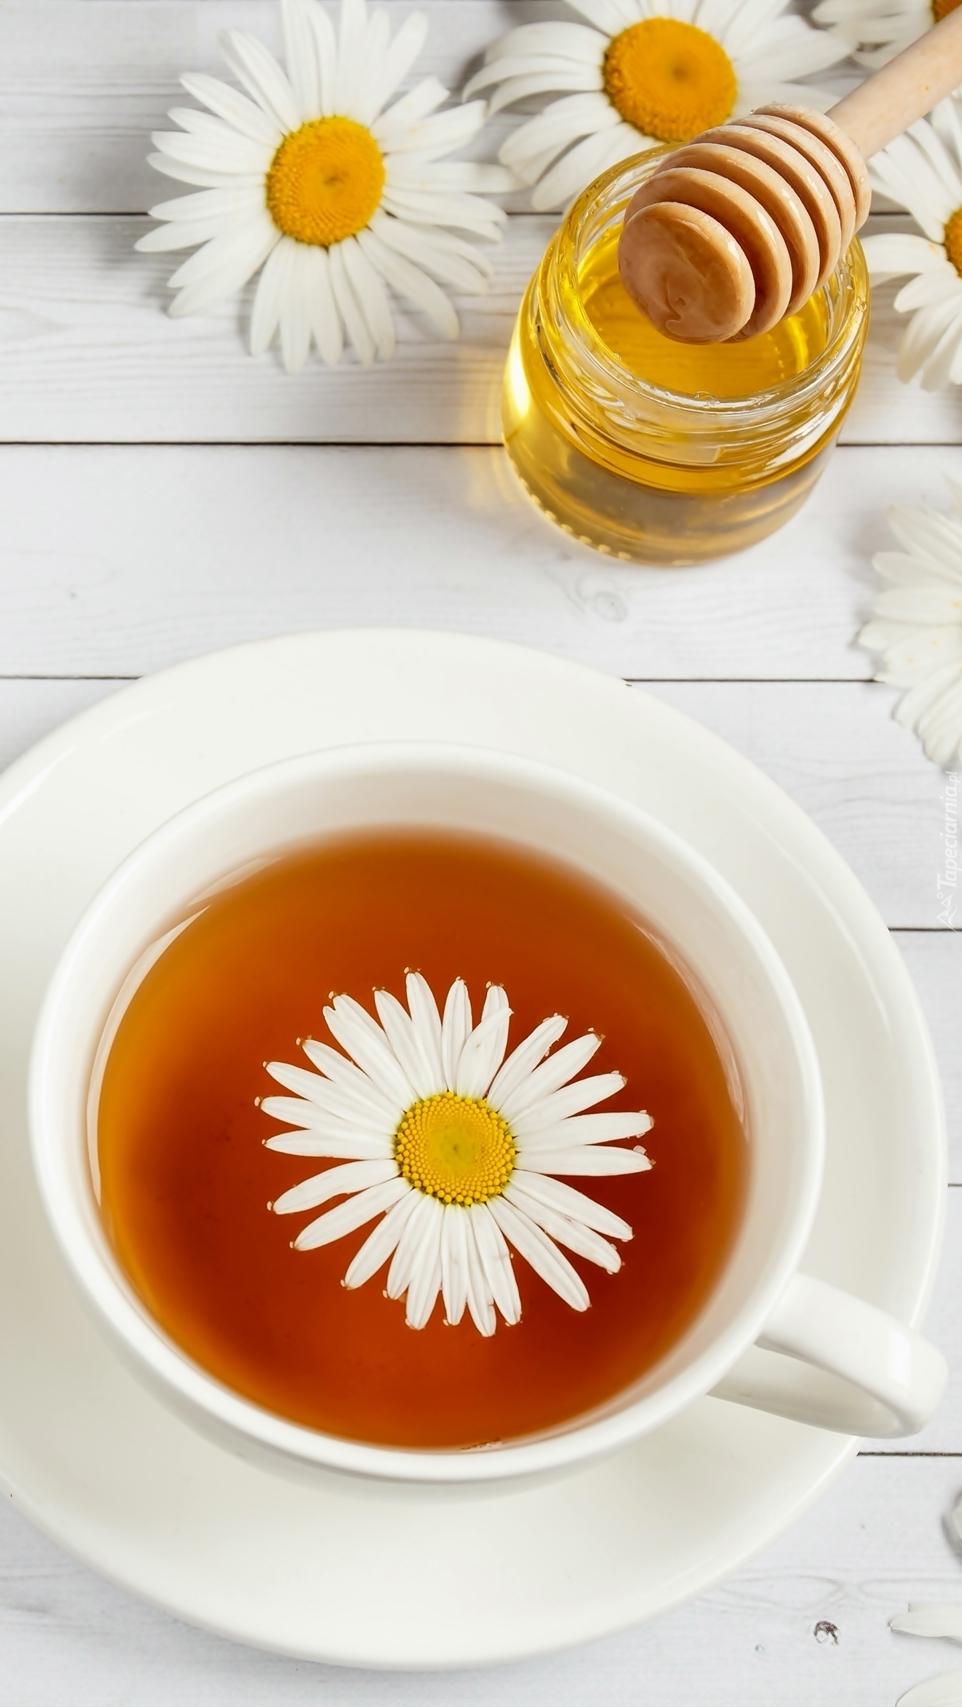 Rumiankowa herbata w filiżance